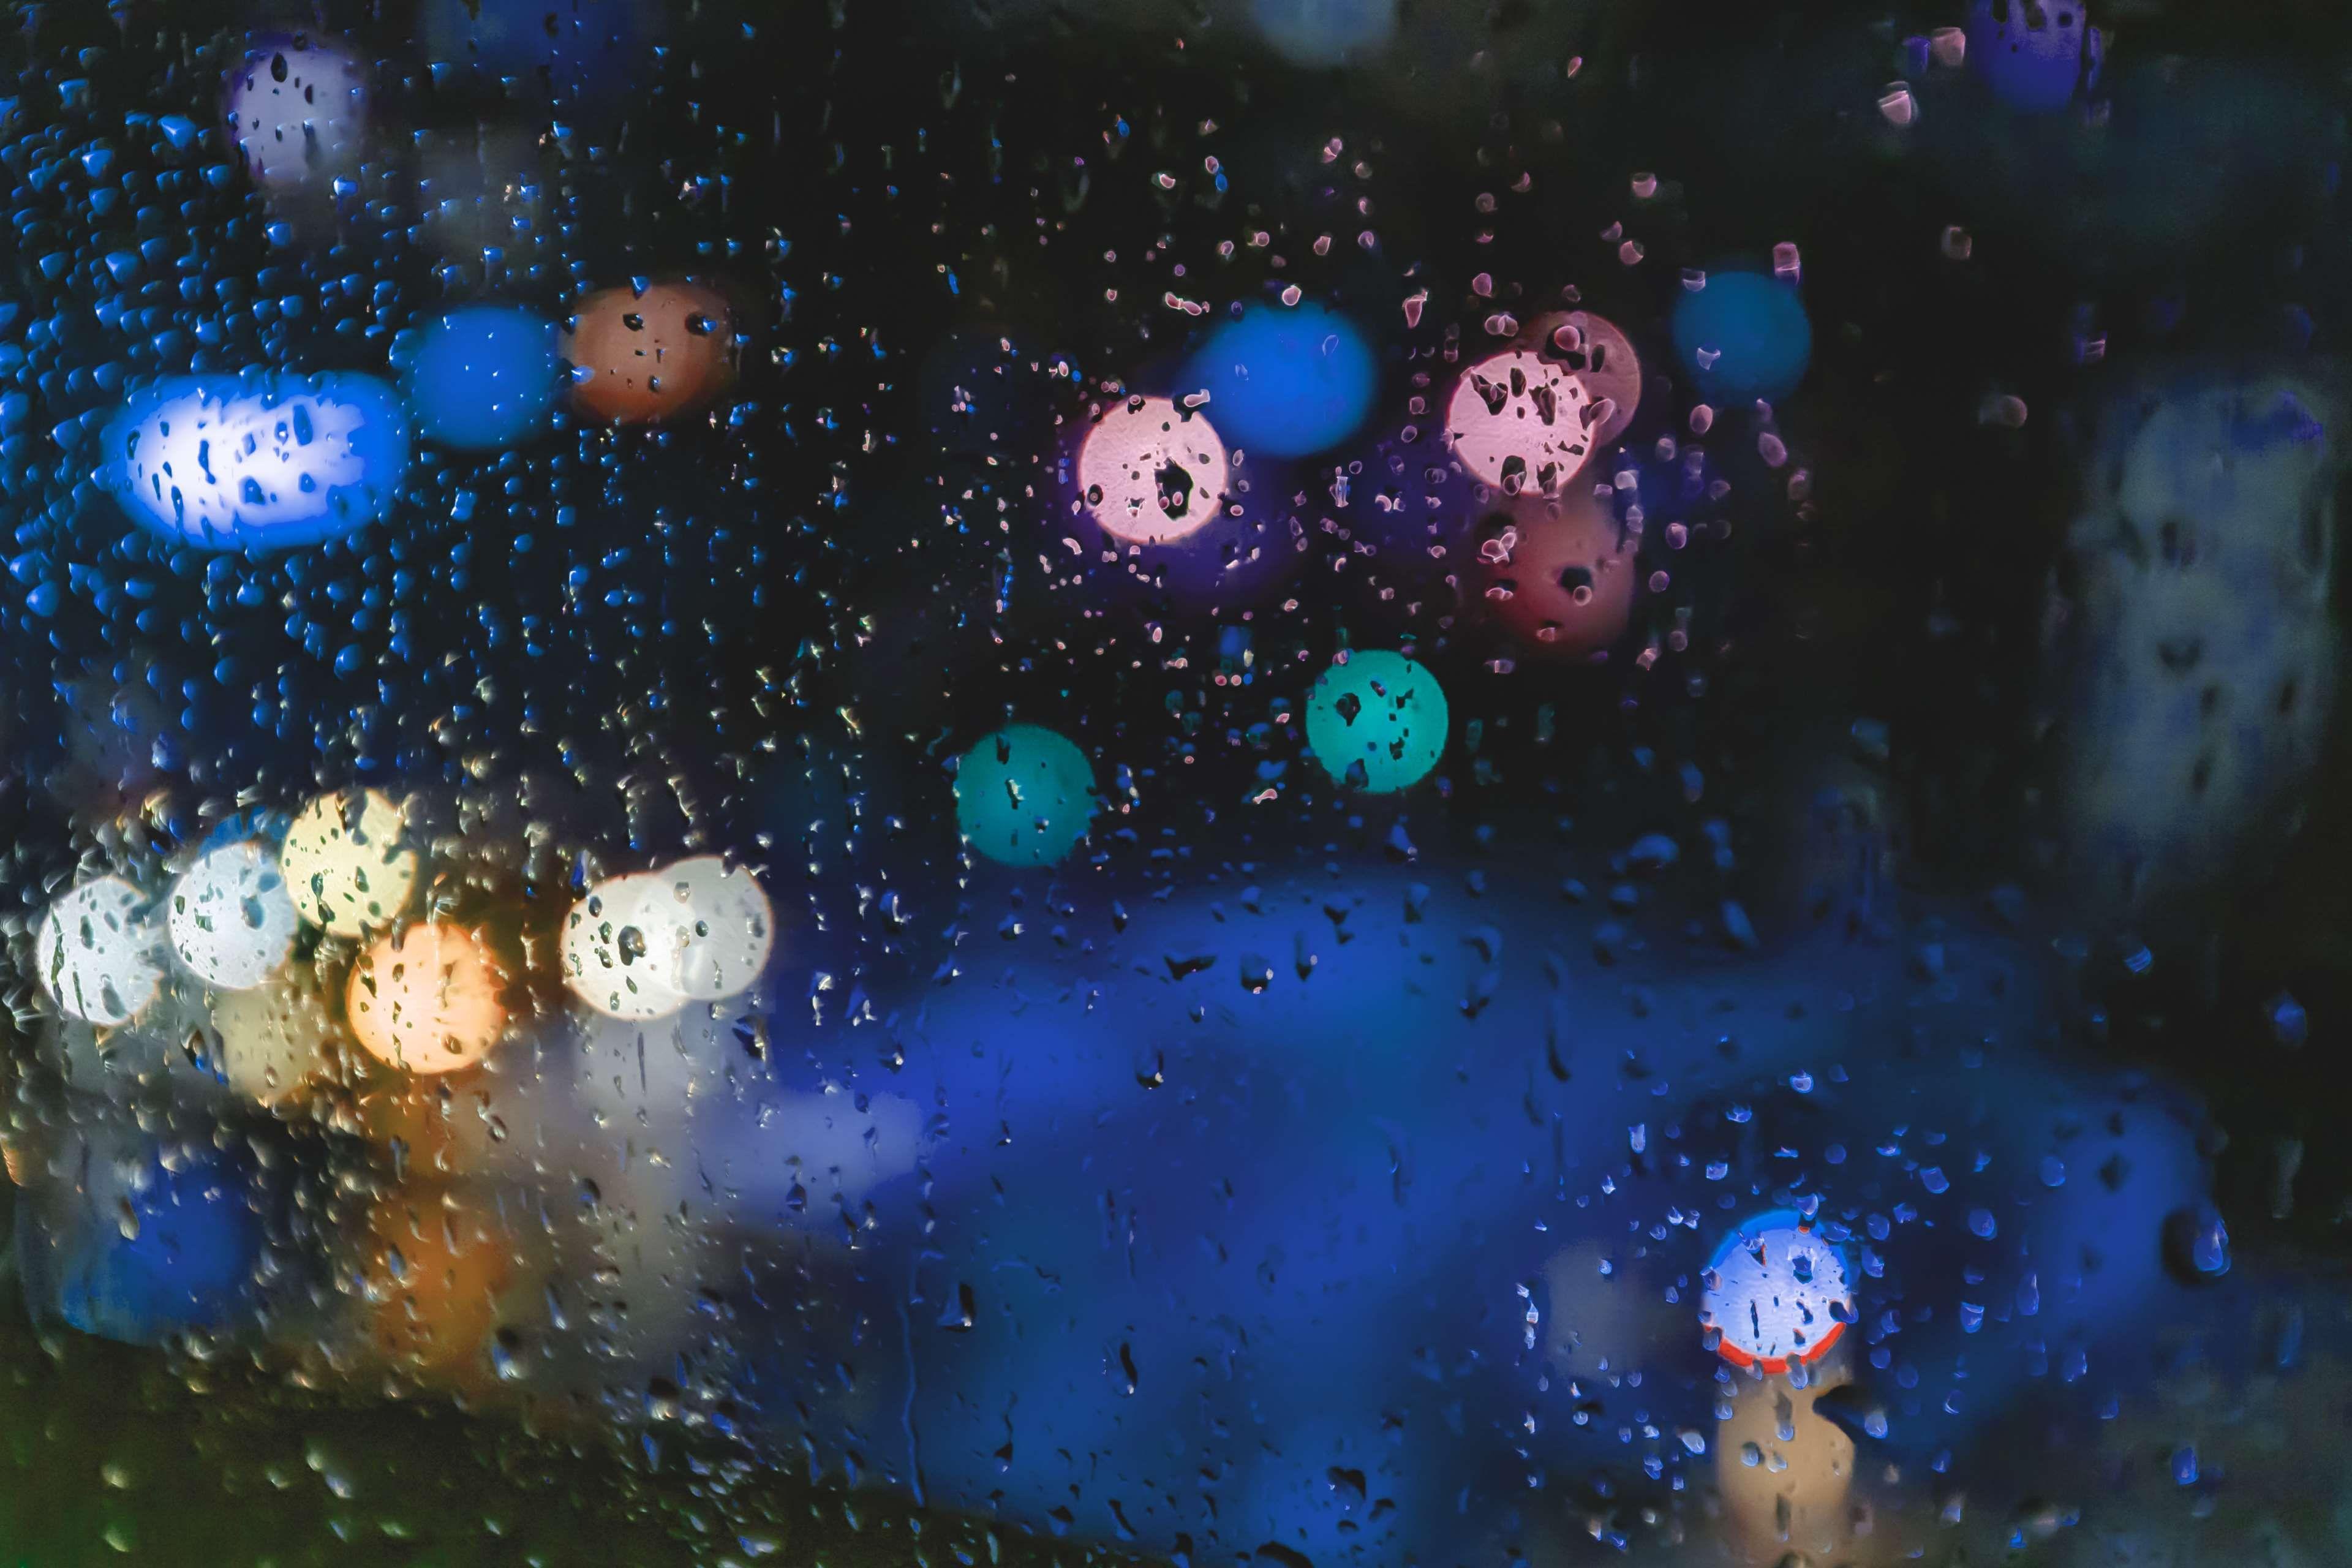 Background Blurred Background Blurry Bokeh City Citylife Lights Rain Window Blurry Lights Cool Wallpaper Aesthetic Light